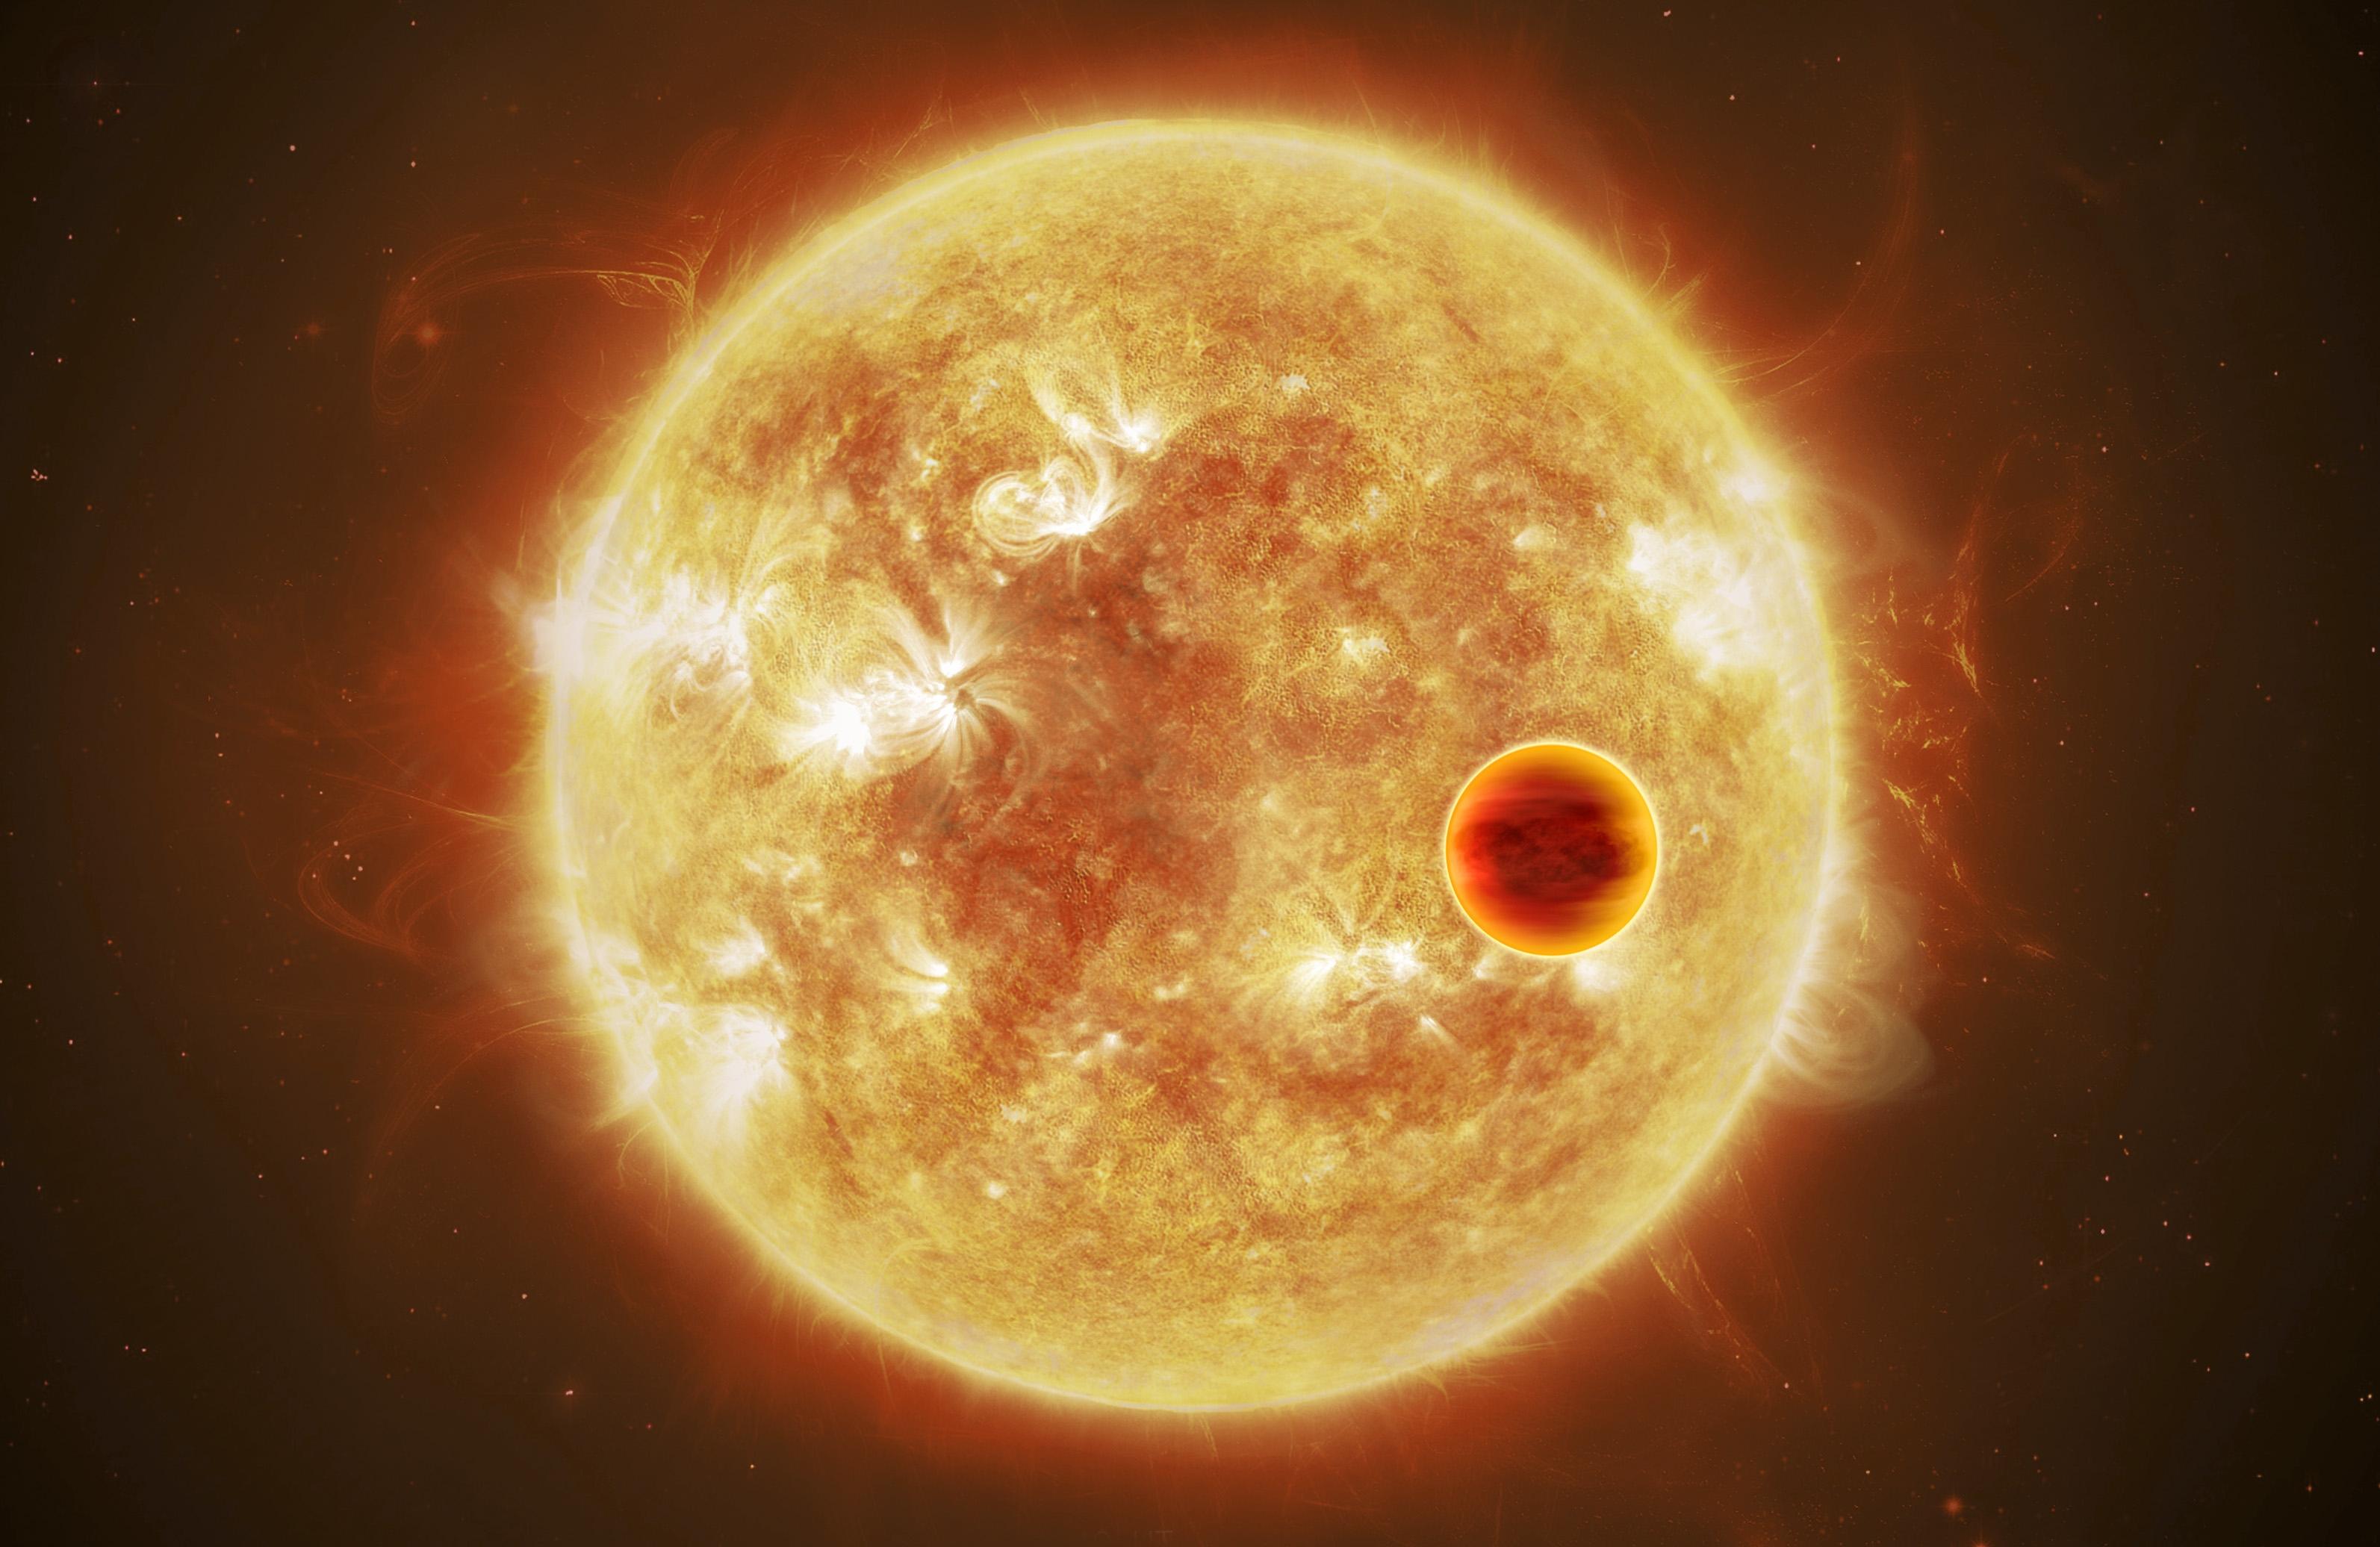 st_ariel_exoplanete.jpg